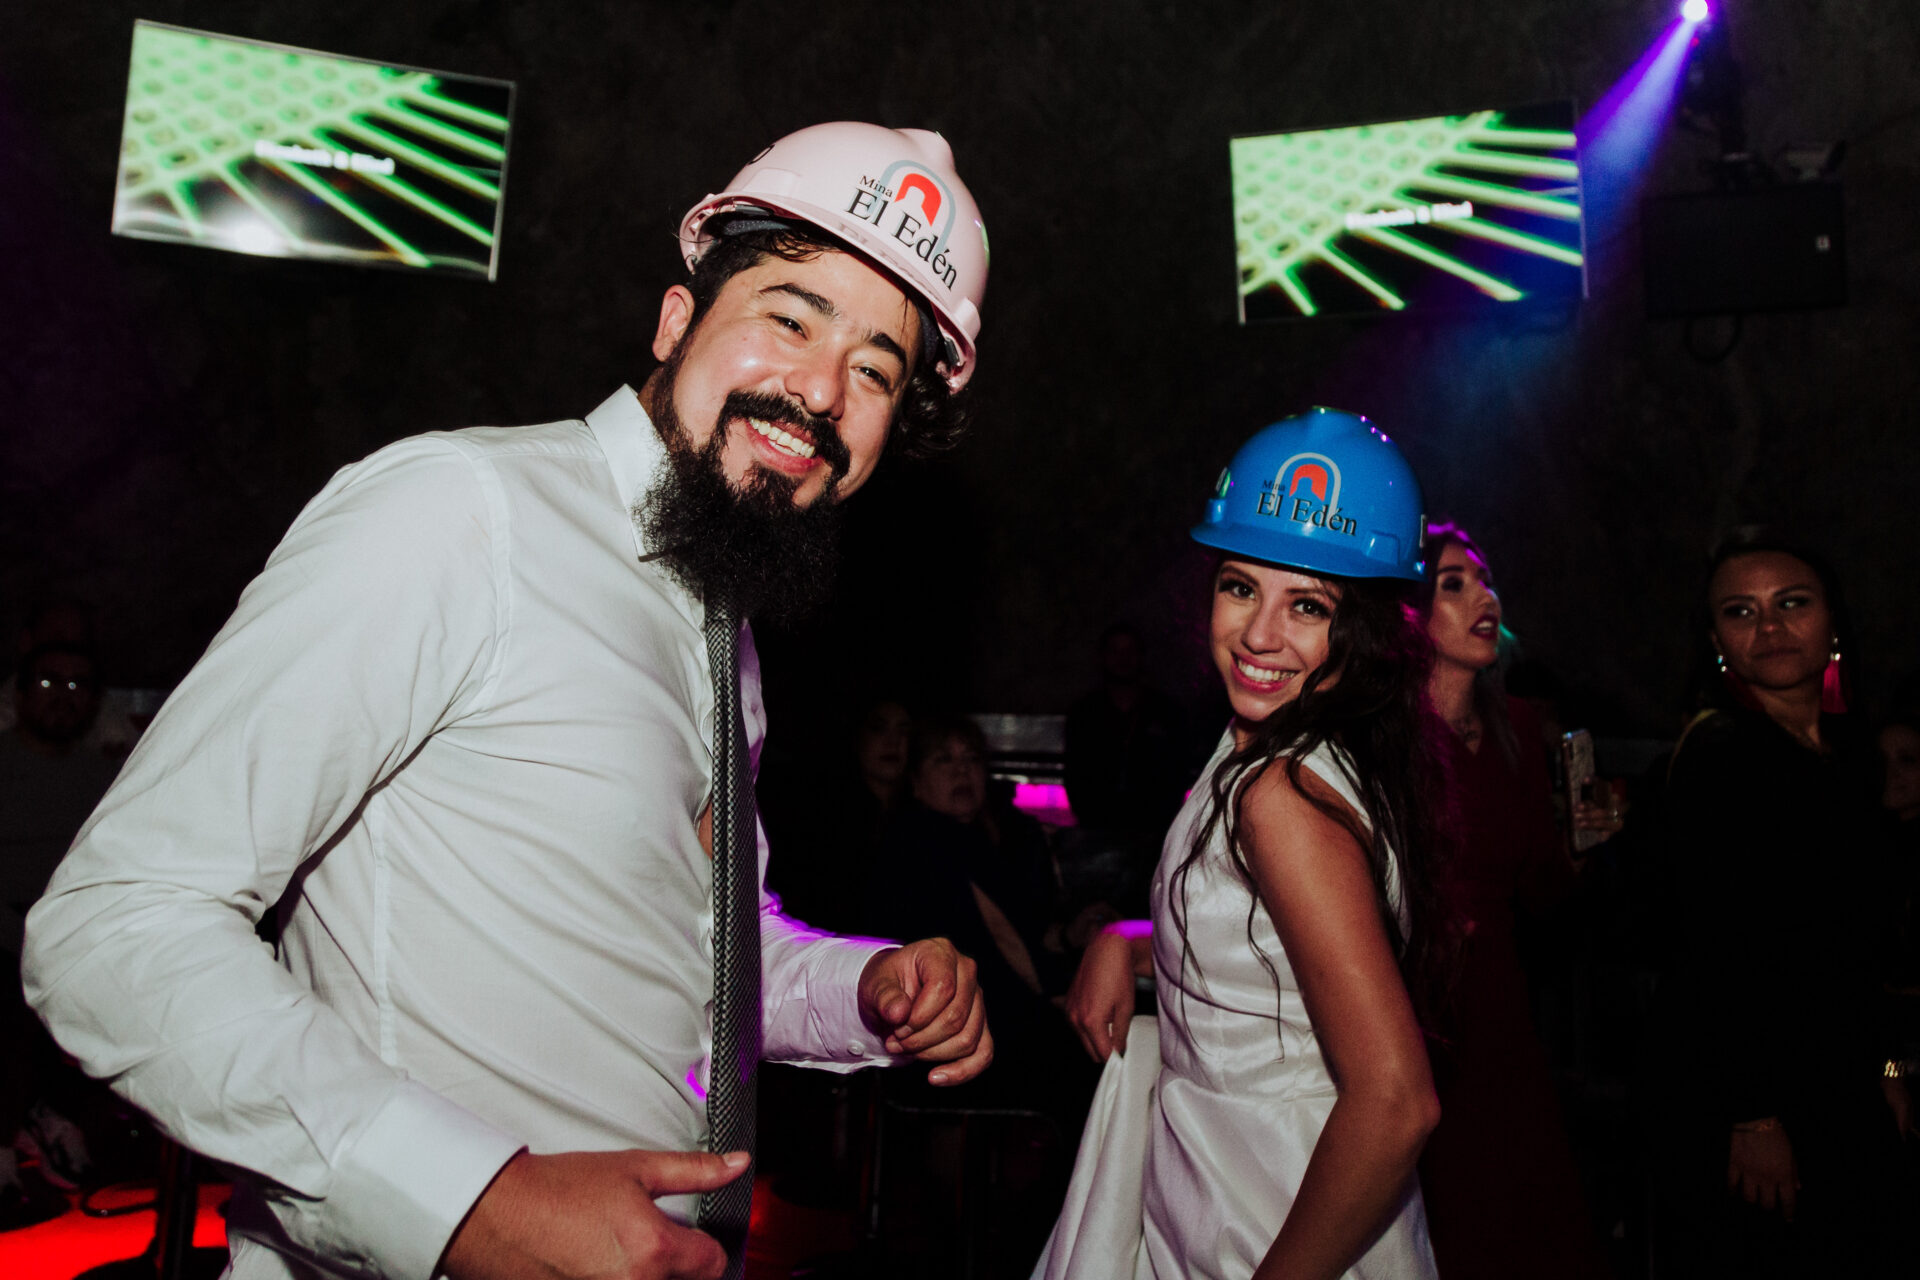 javier_noriega_fotografo_bodas_la_mina_club_zacatecas_wedding_photographer32